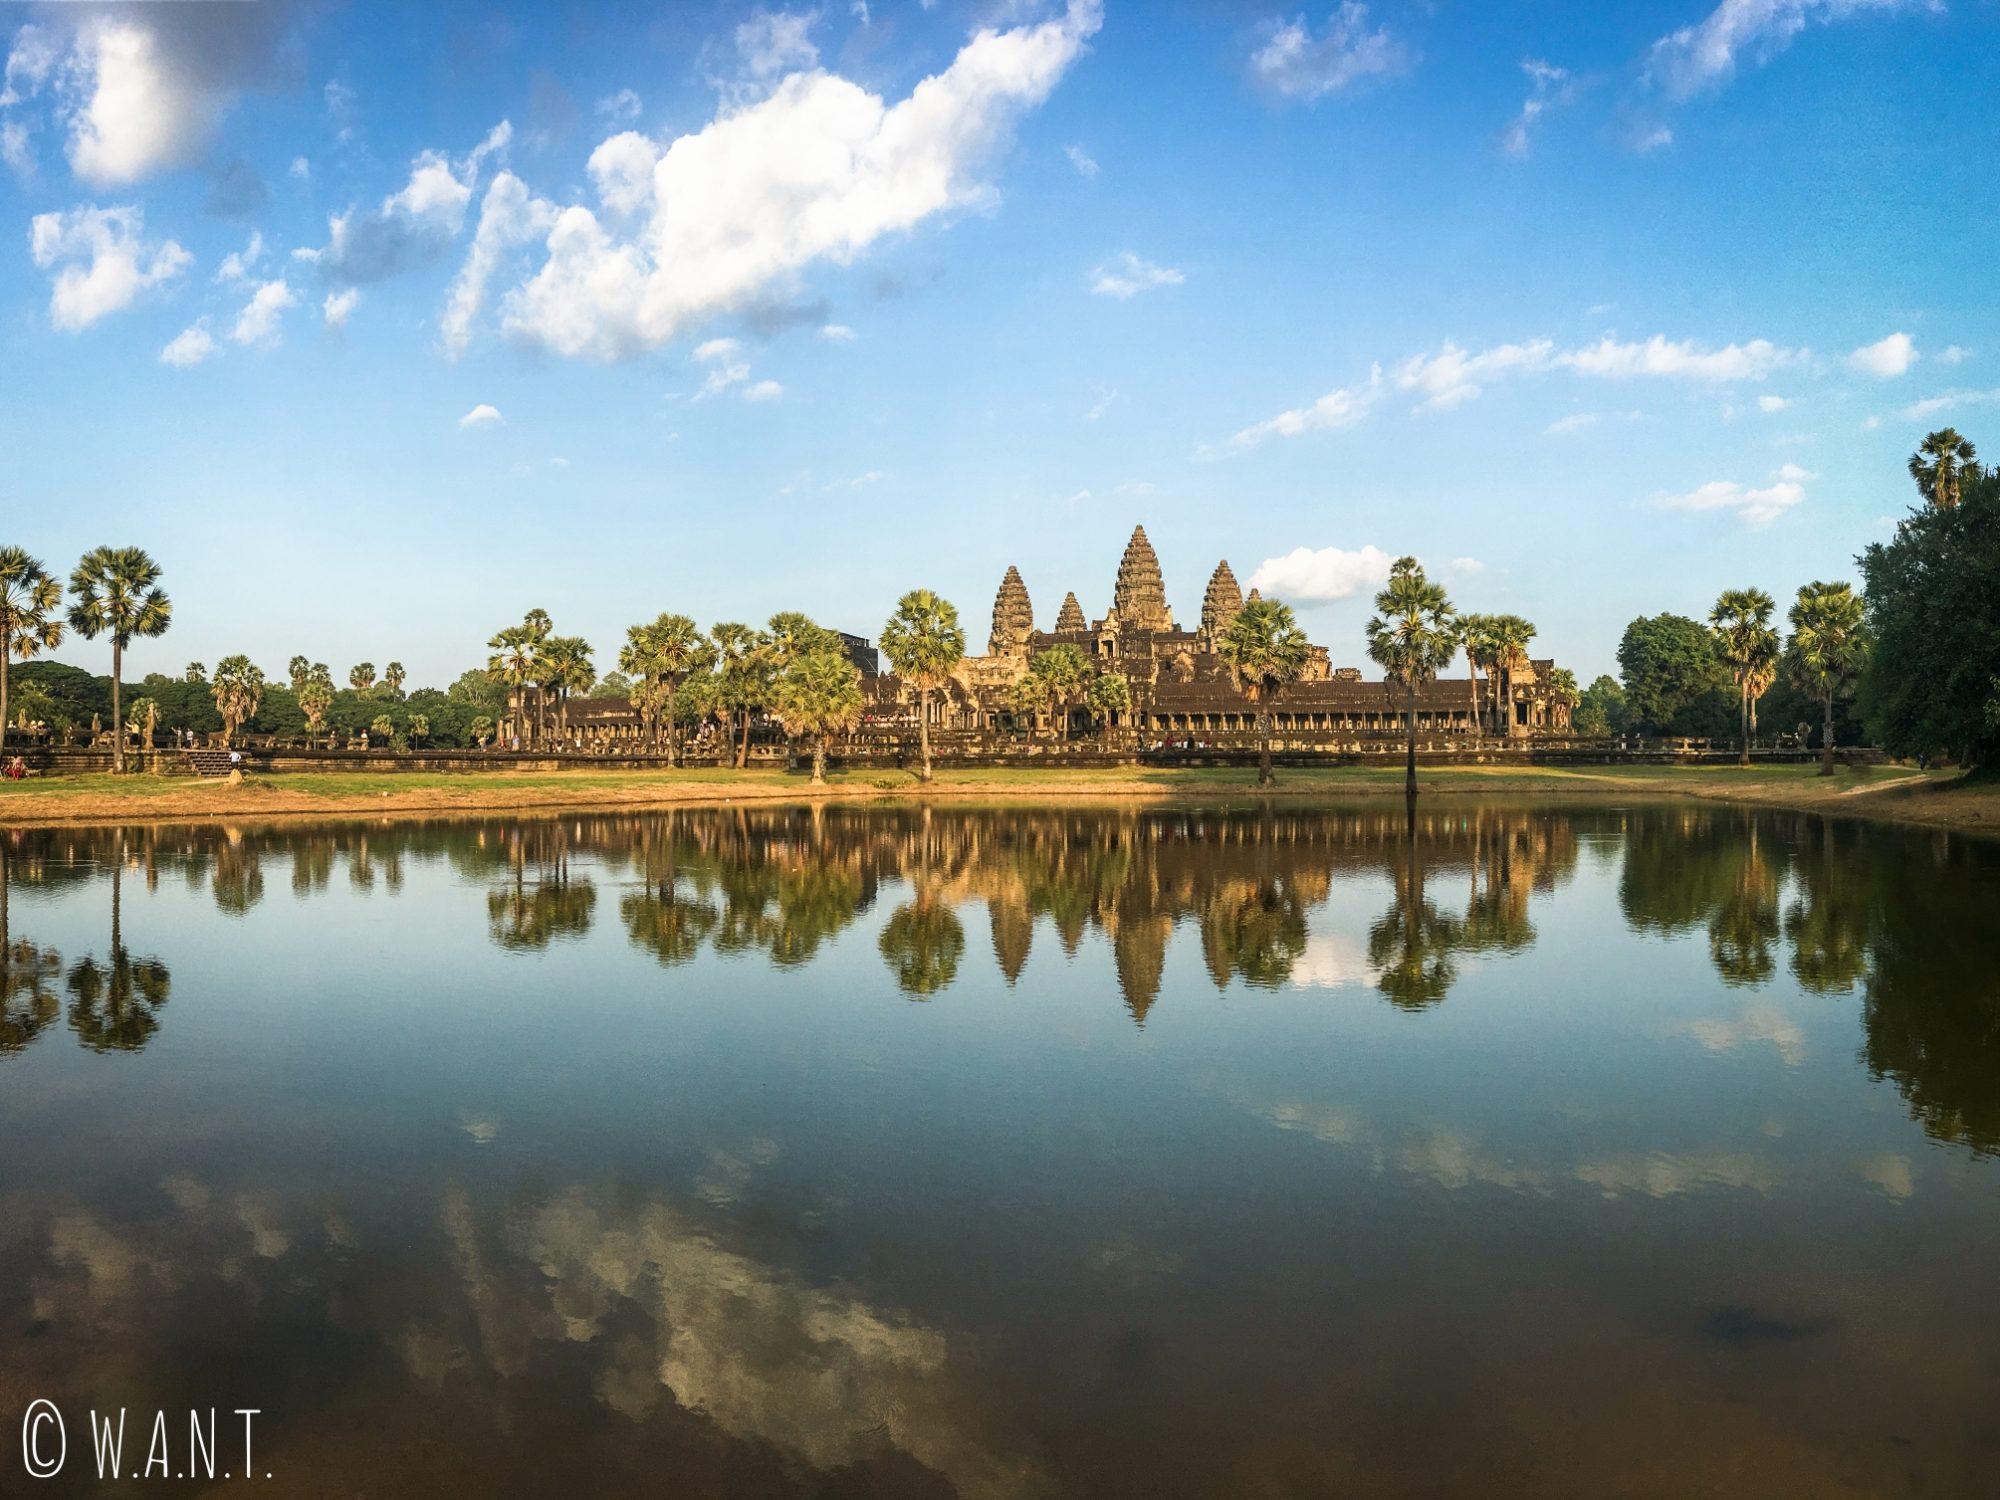 Reflet d'Angkor Wat dans l'eau à Siem Reap